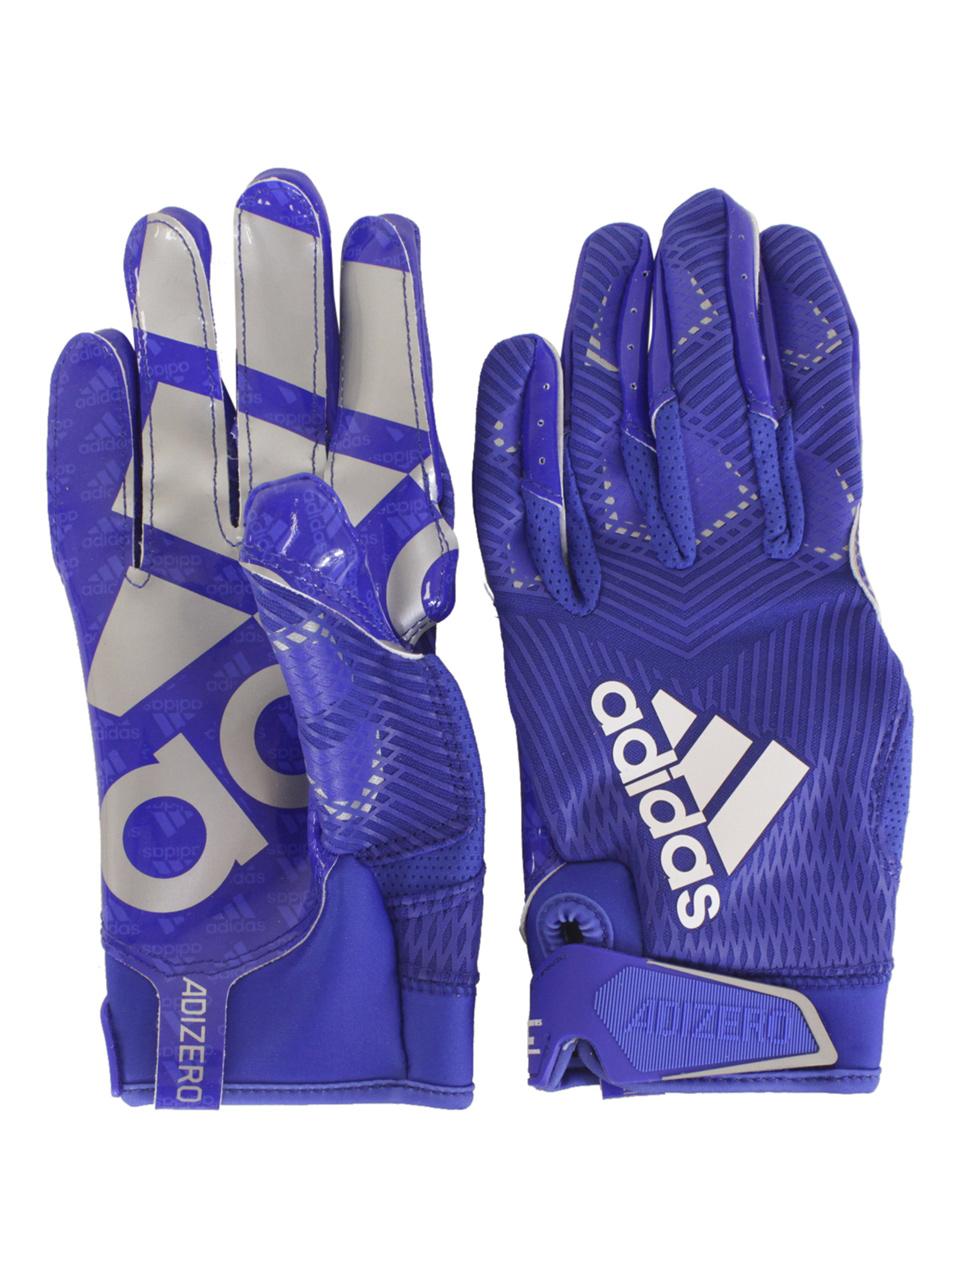 Adizero-8.0 Football Receiver Gloves